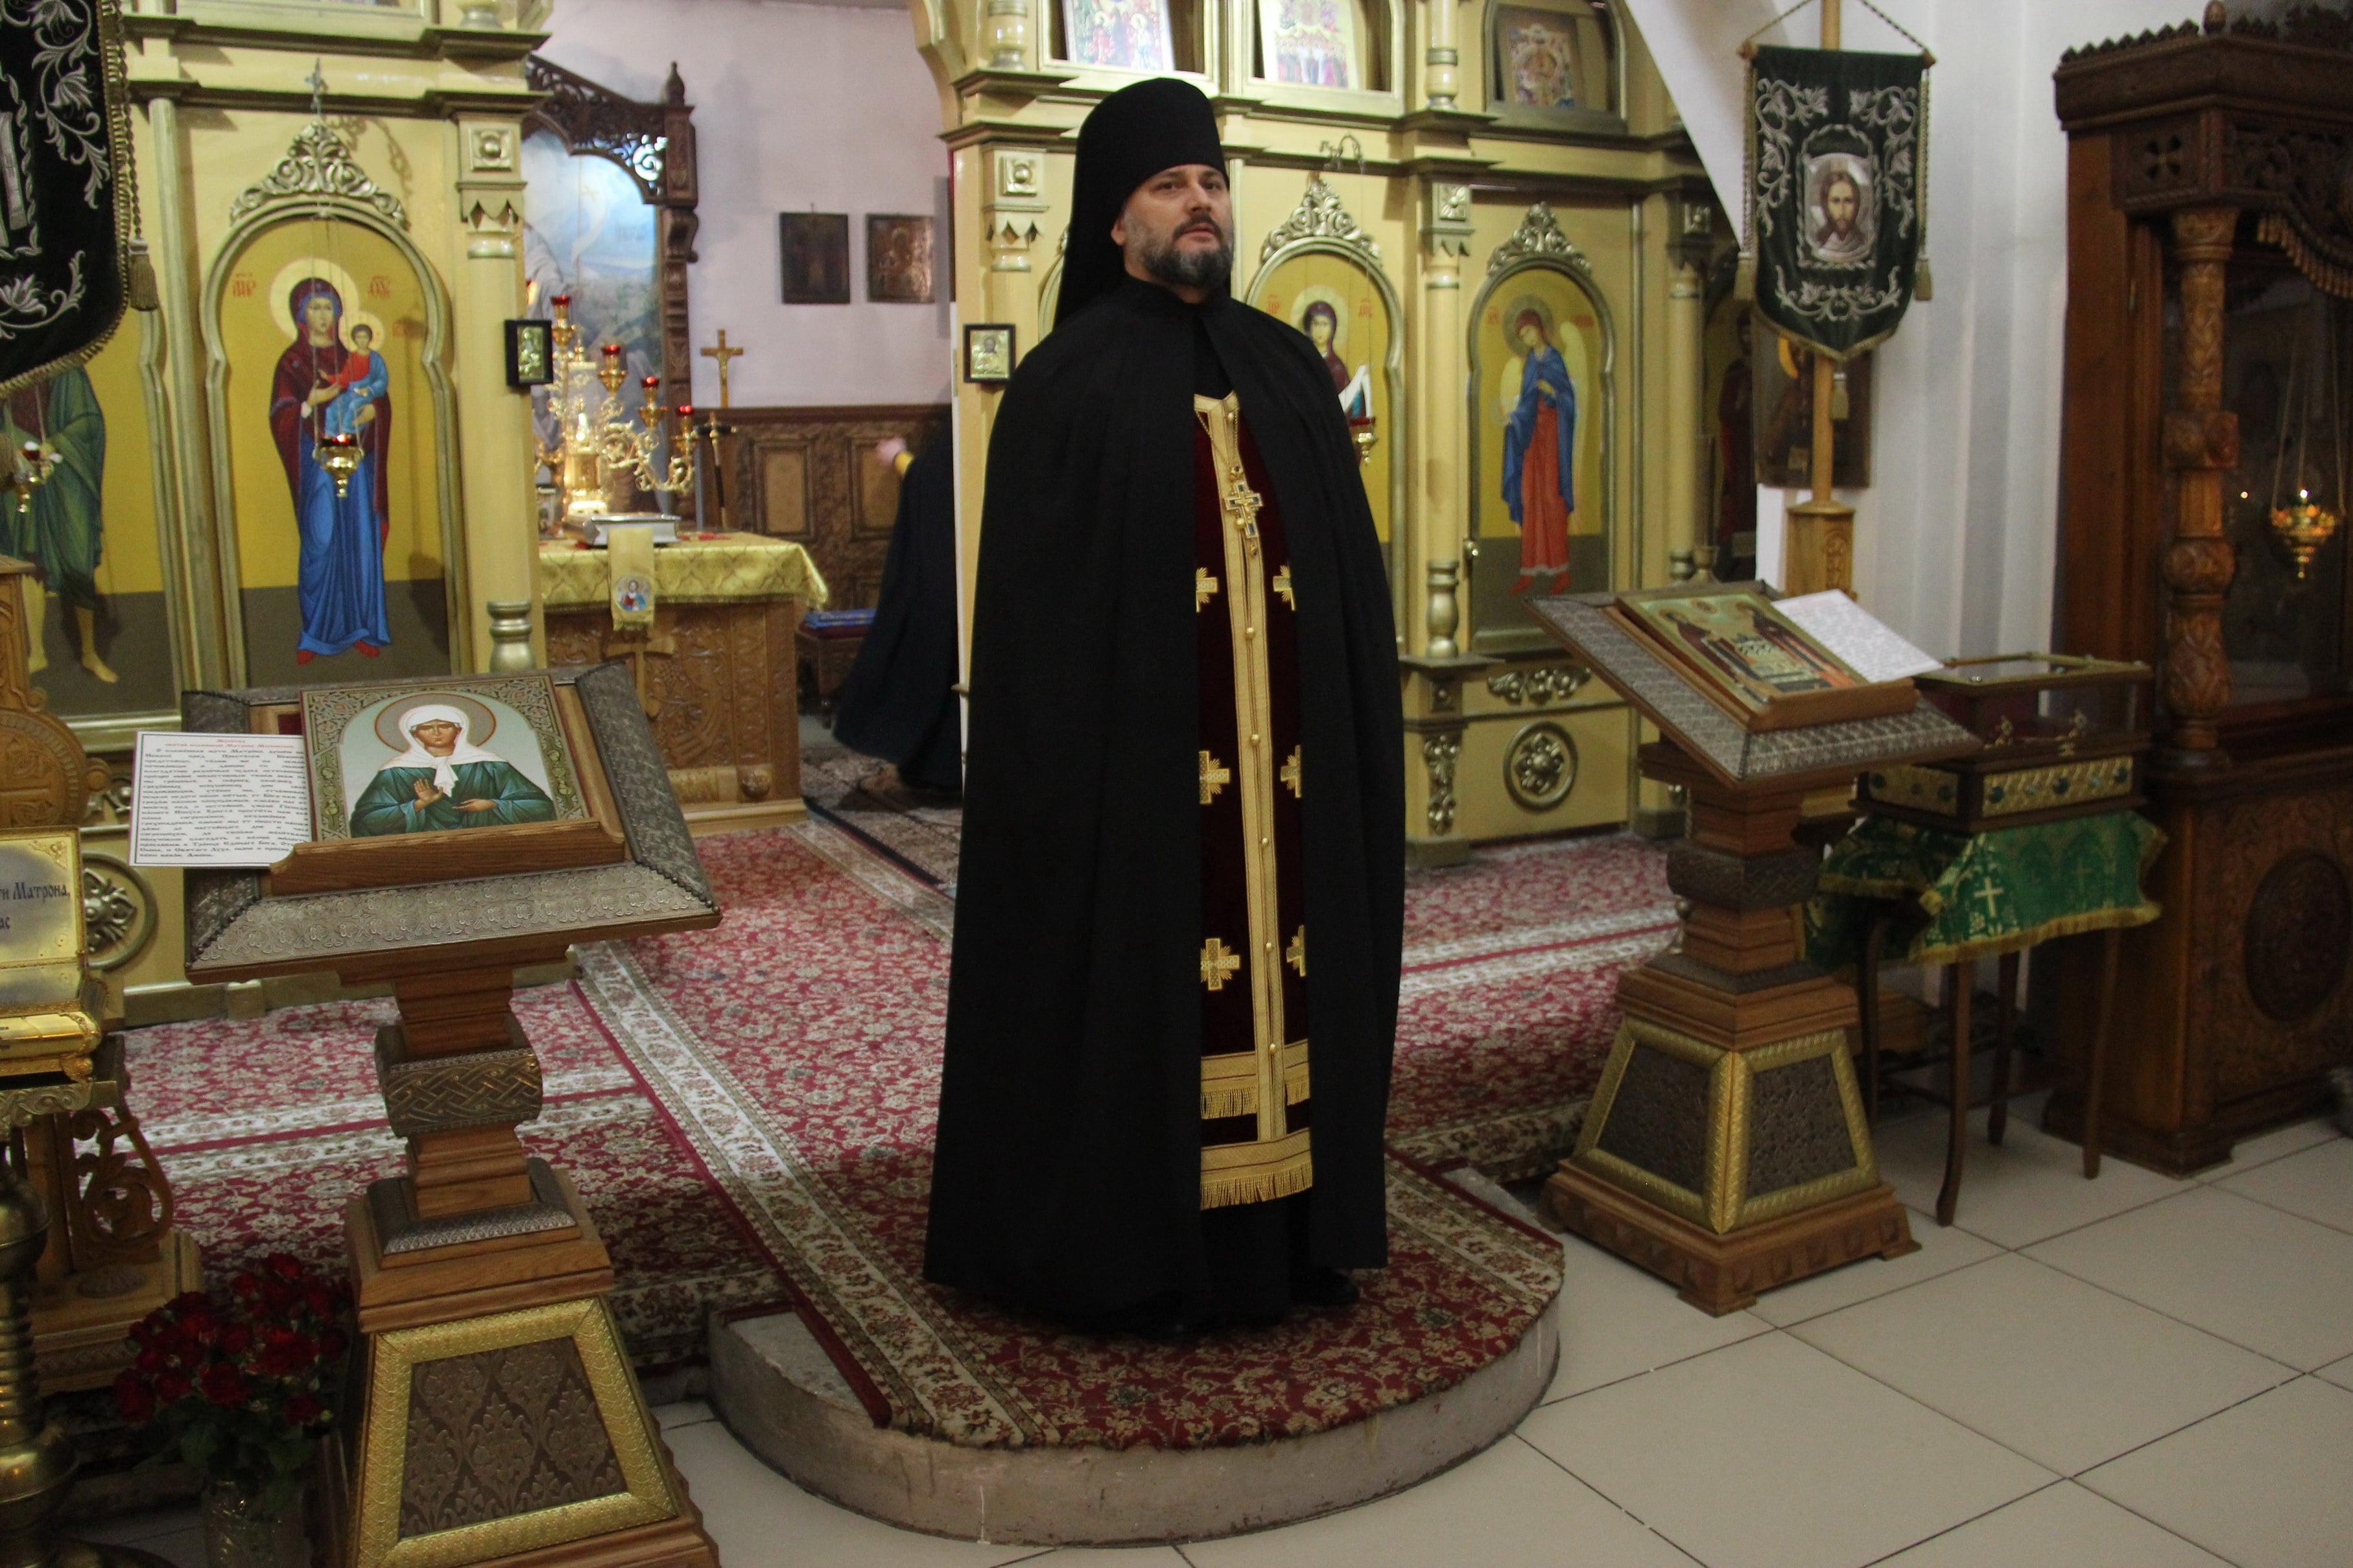 http://monuspen.ru/photoreports/71ea17f3616be5f8a0a27da2b3975a6n.JPG